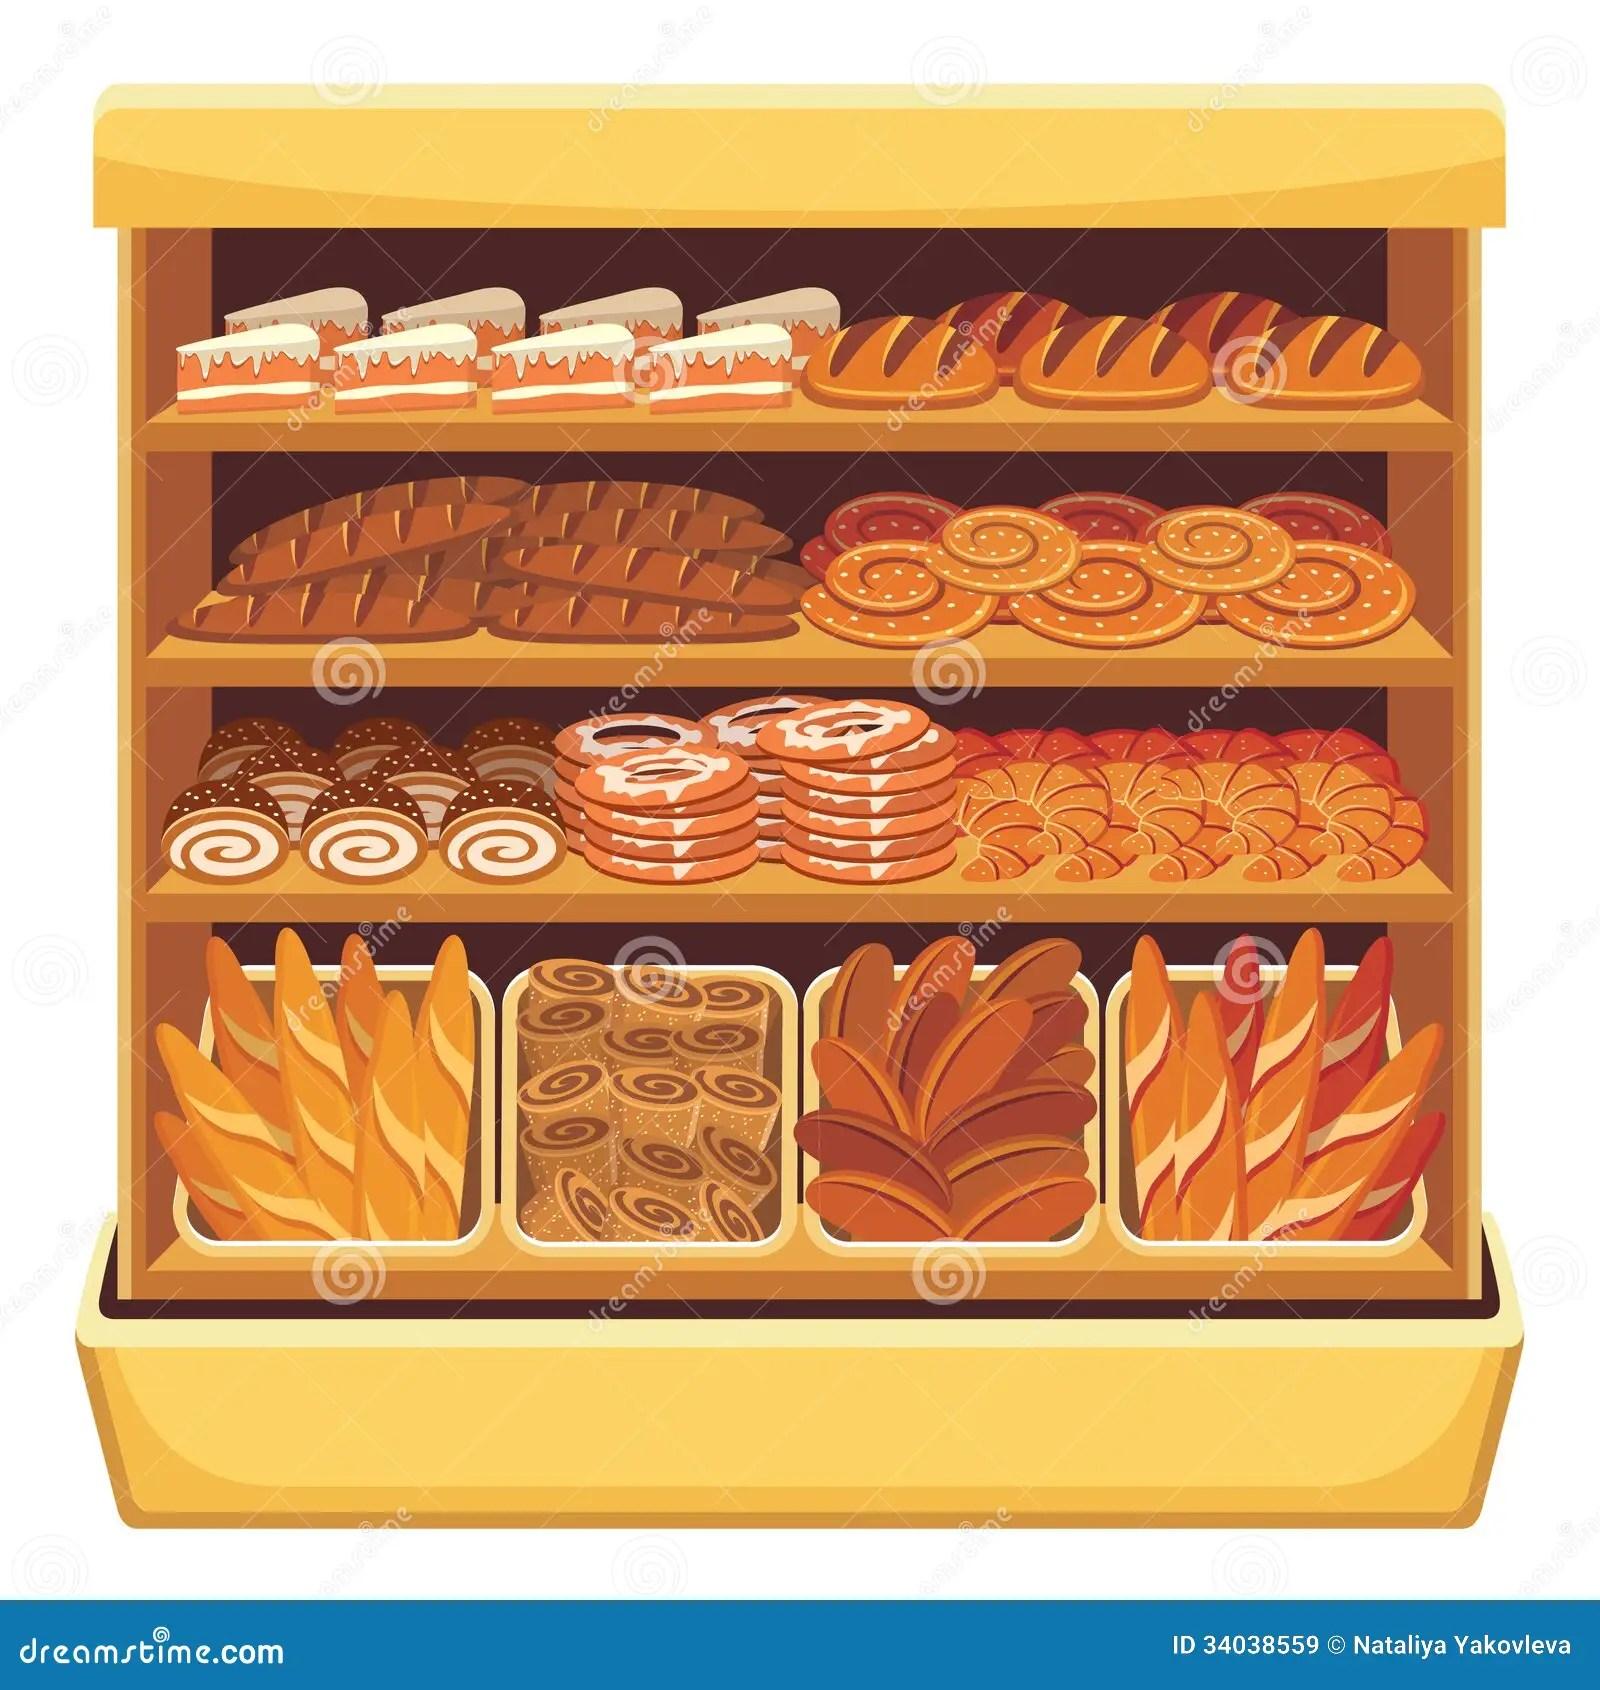 Supermarket Bread Showcase Royalty Free Stock Images